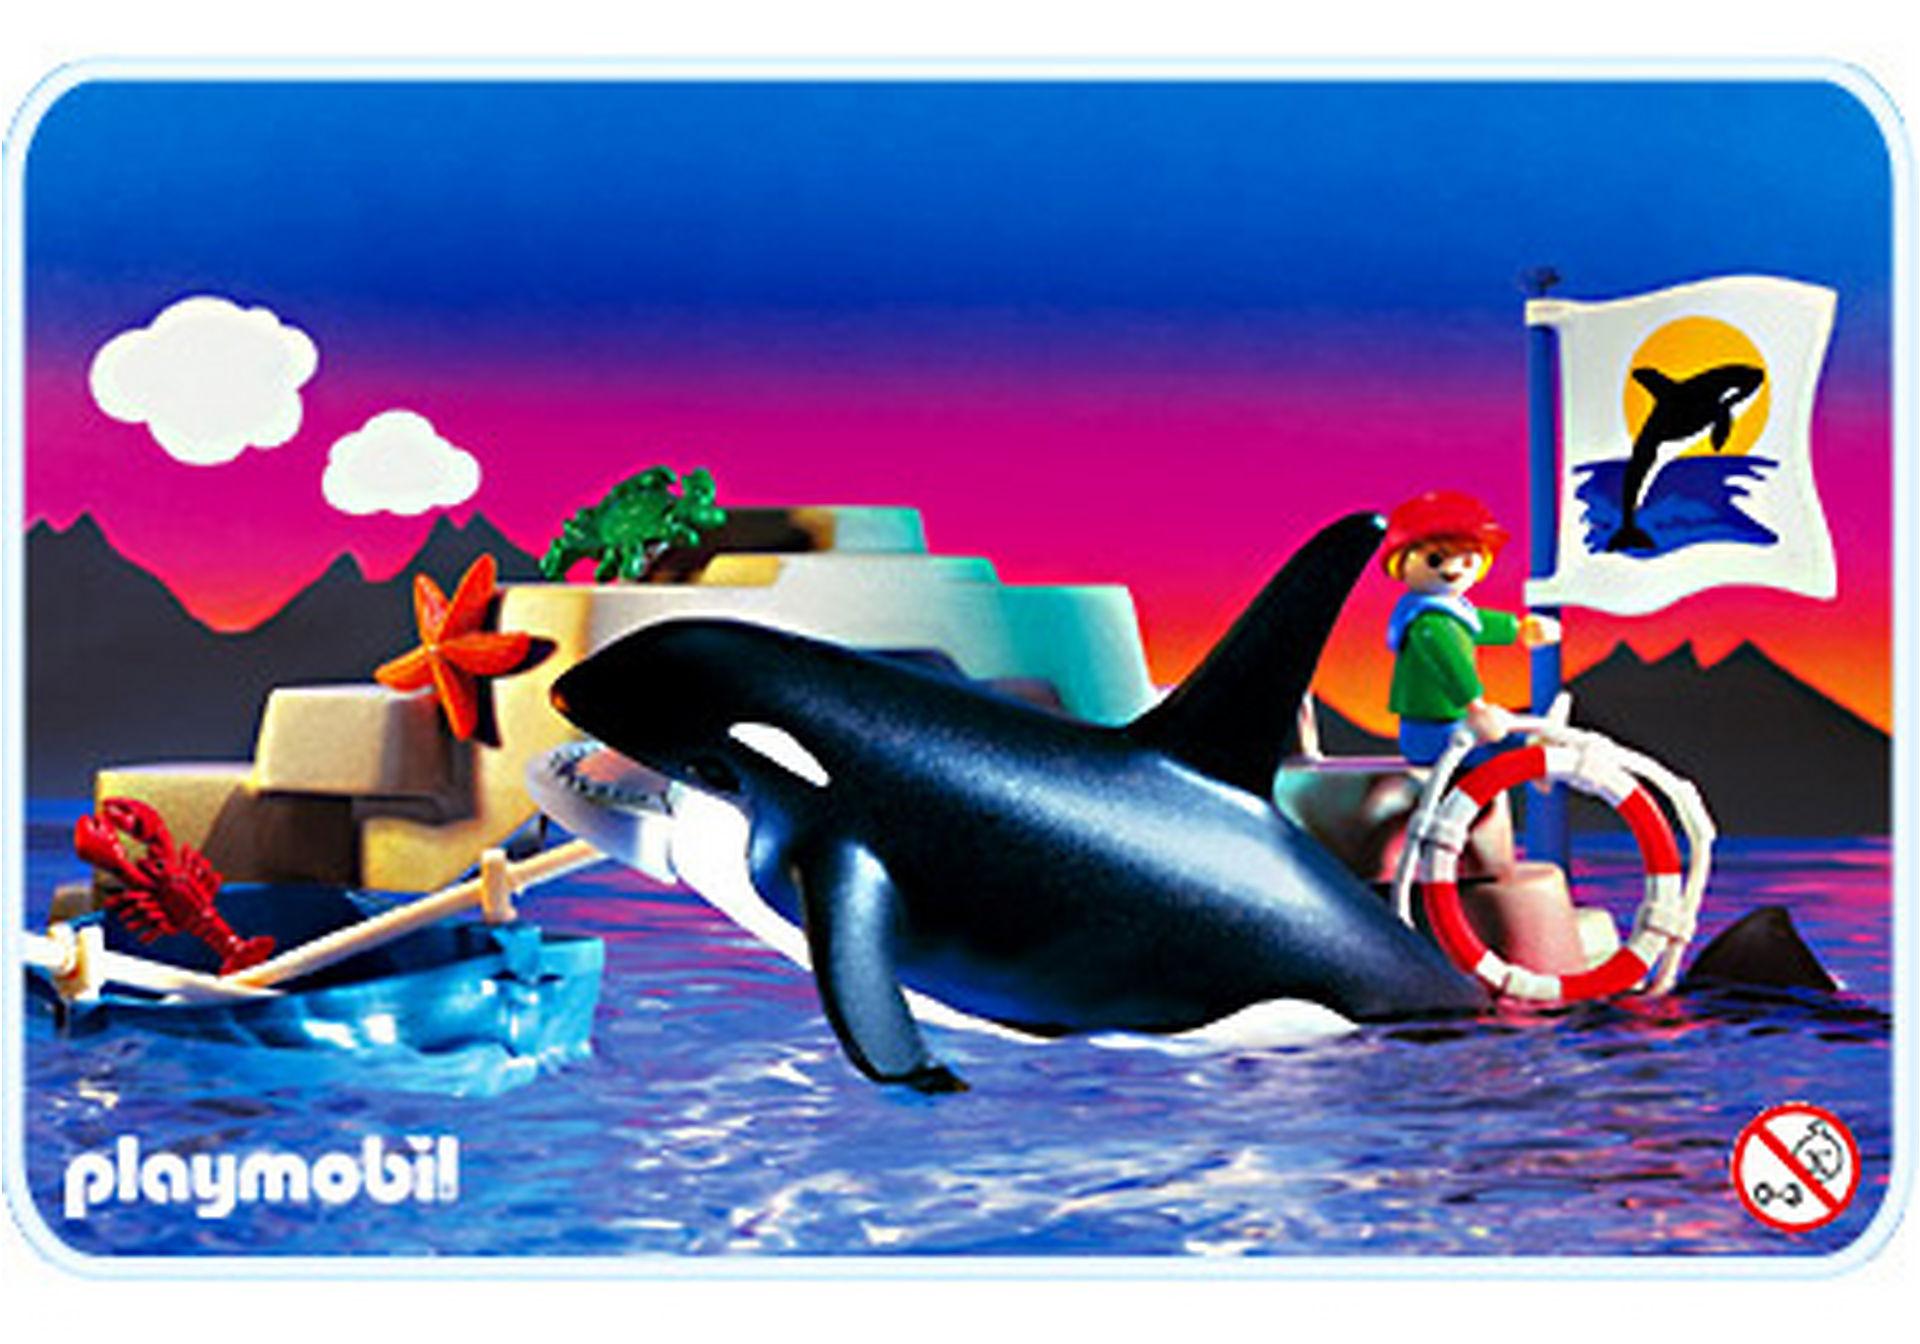 http://media.playmobil.com/i/playmobil/3865-A_product_detail/Enfant / orque